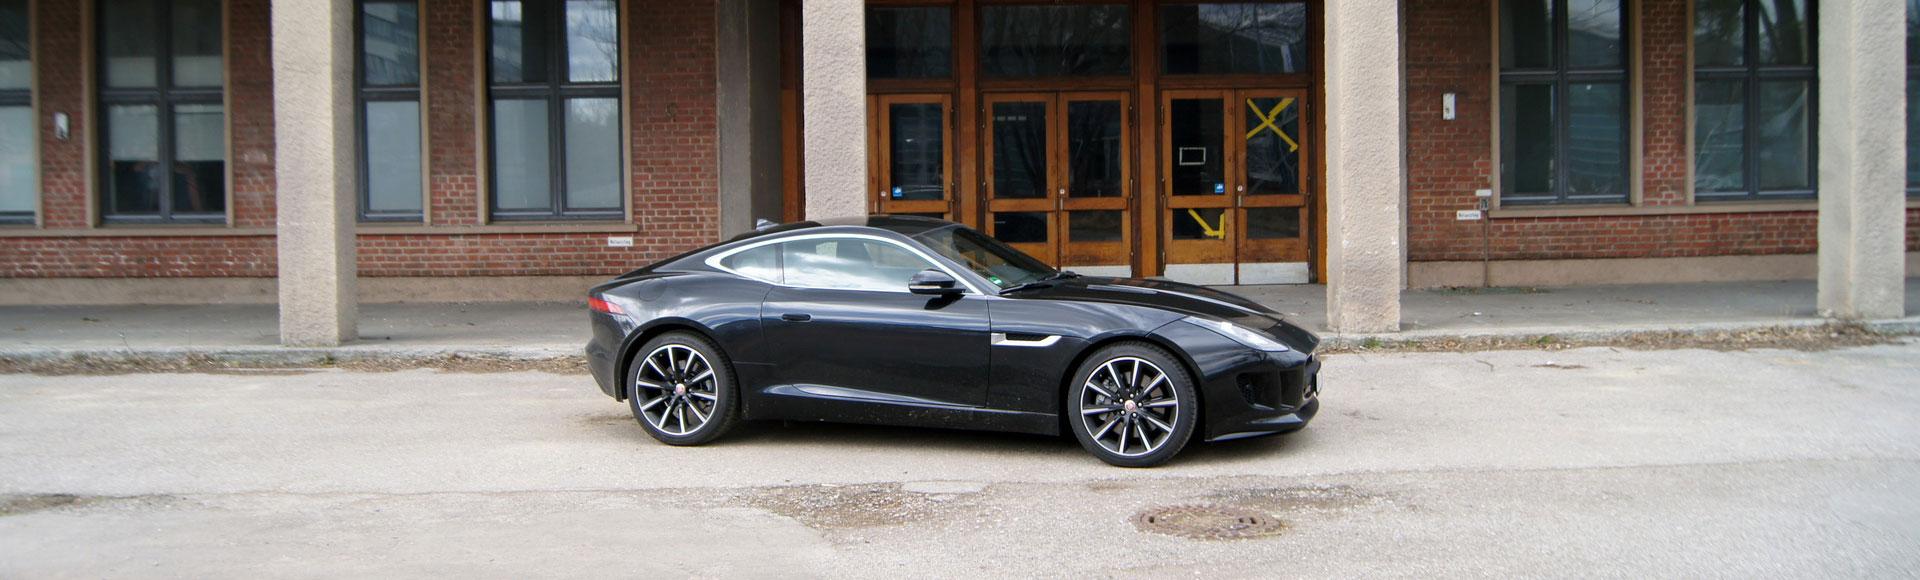 Jaguar F Type 2015 9535